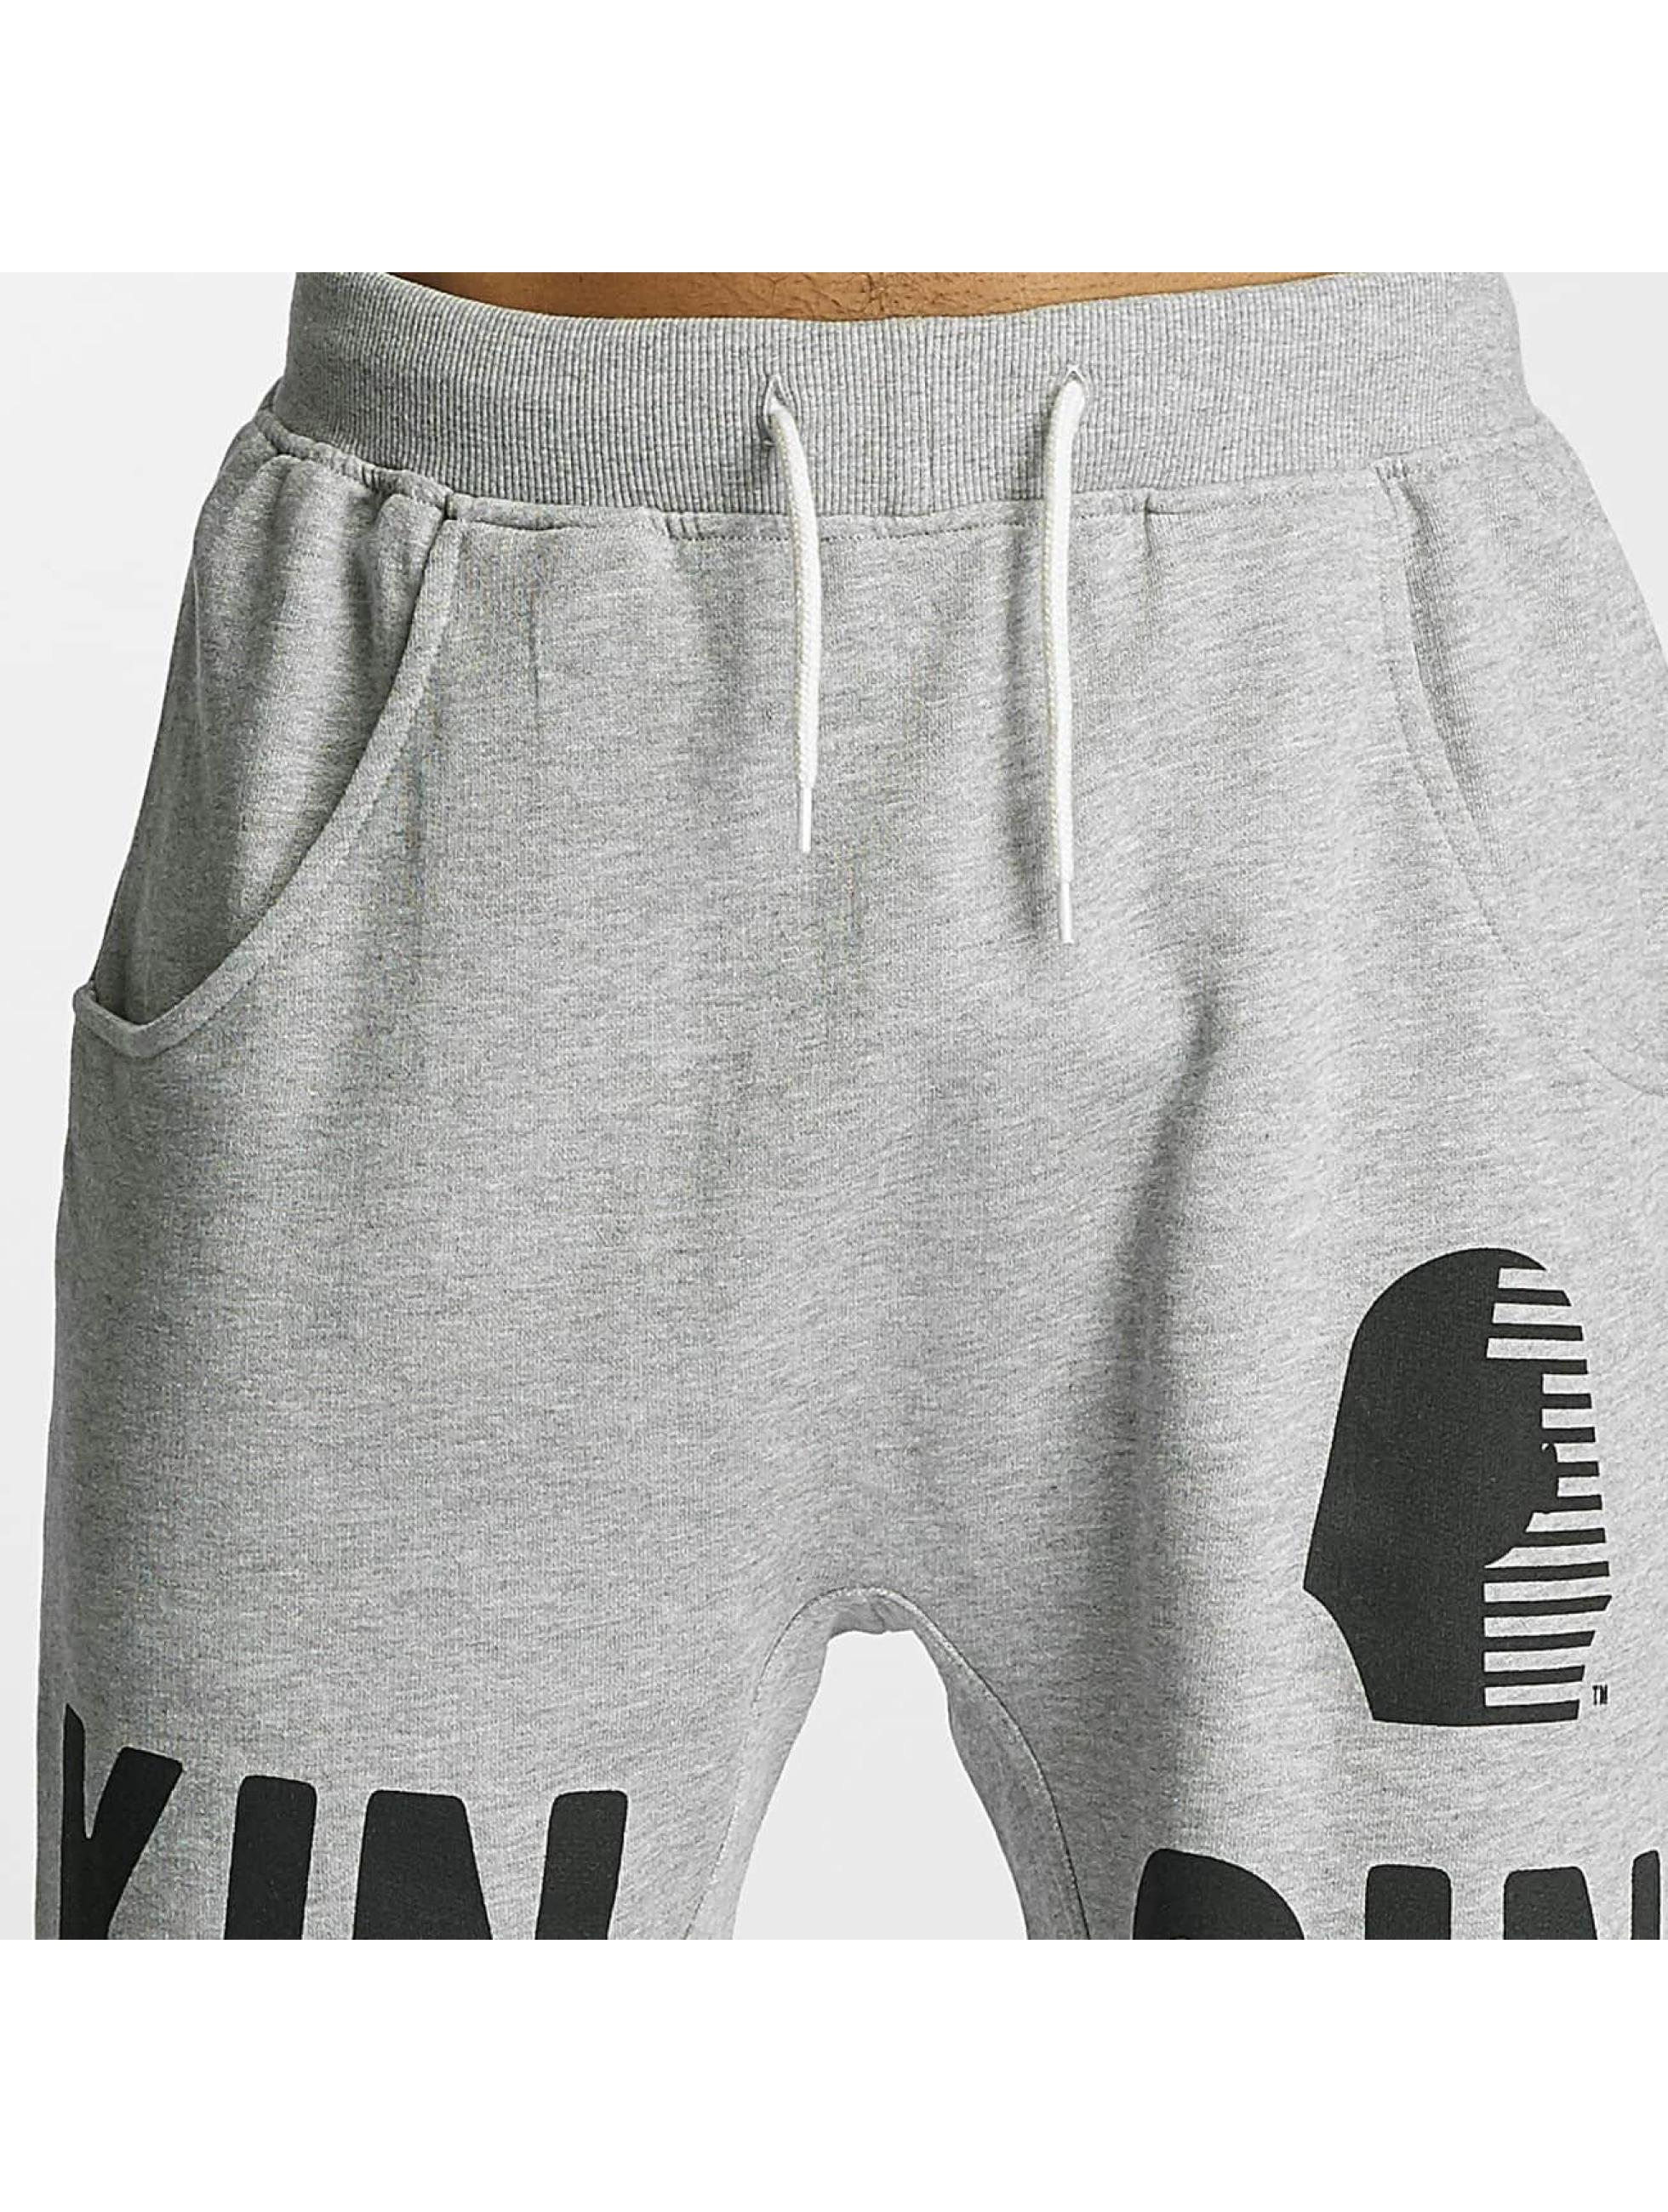 Kingin Shorts Anubis grigio